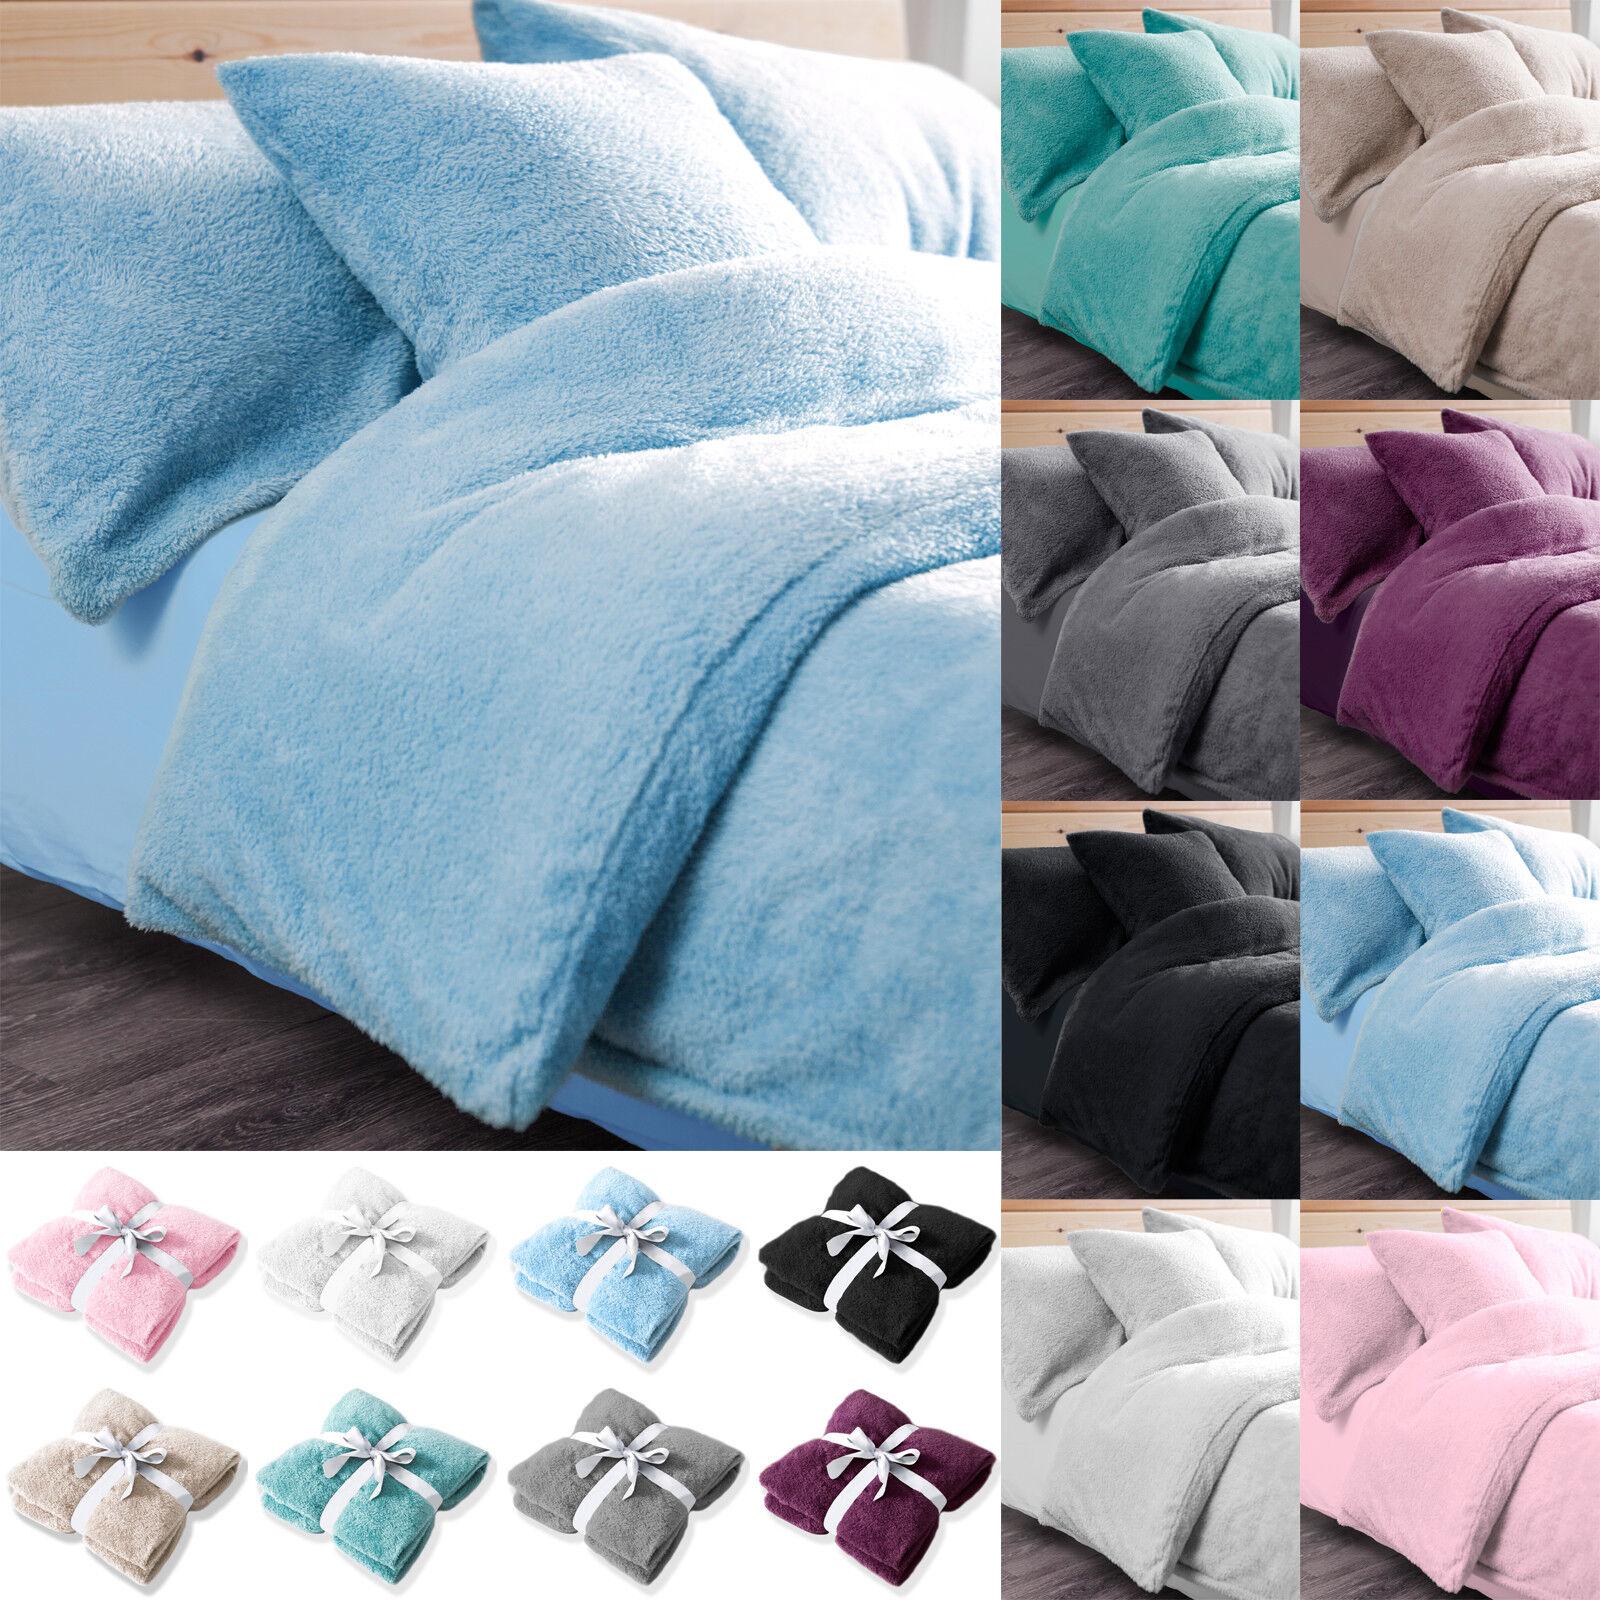 Teddy Duvet Cover Sets Throw Single Double King Größes Super Quilt Fleece Bedding